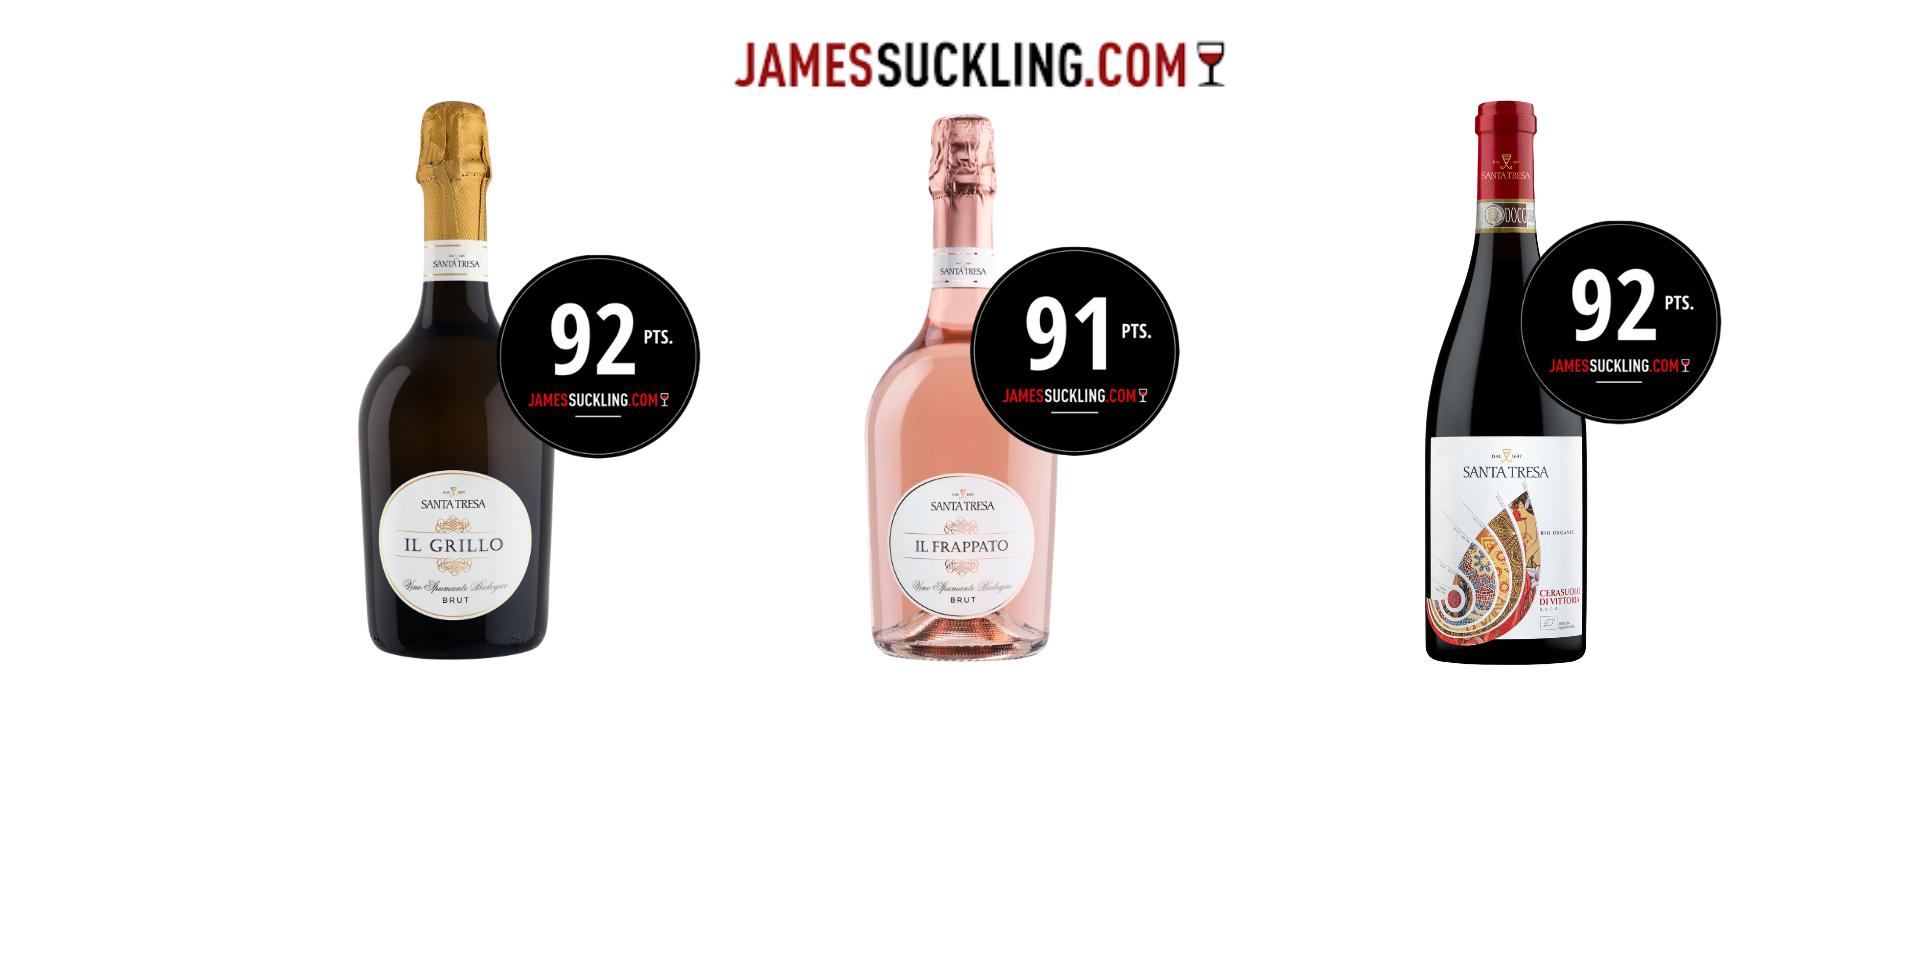 James Suckling - I punteggi